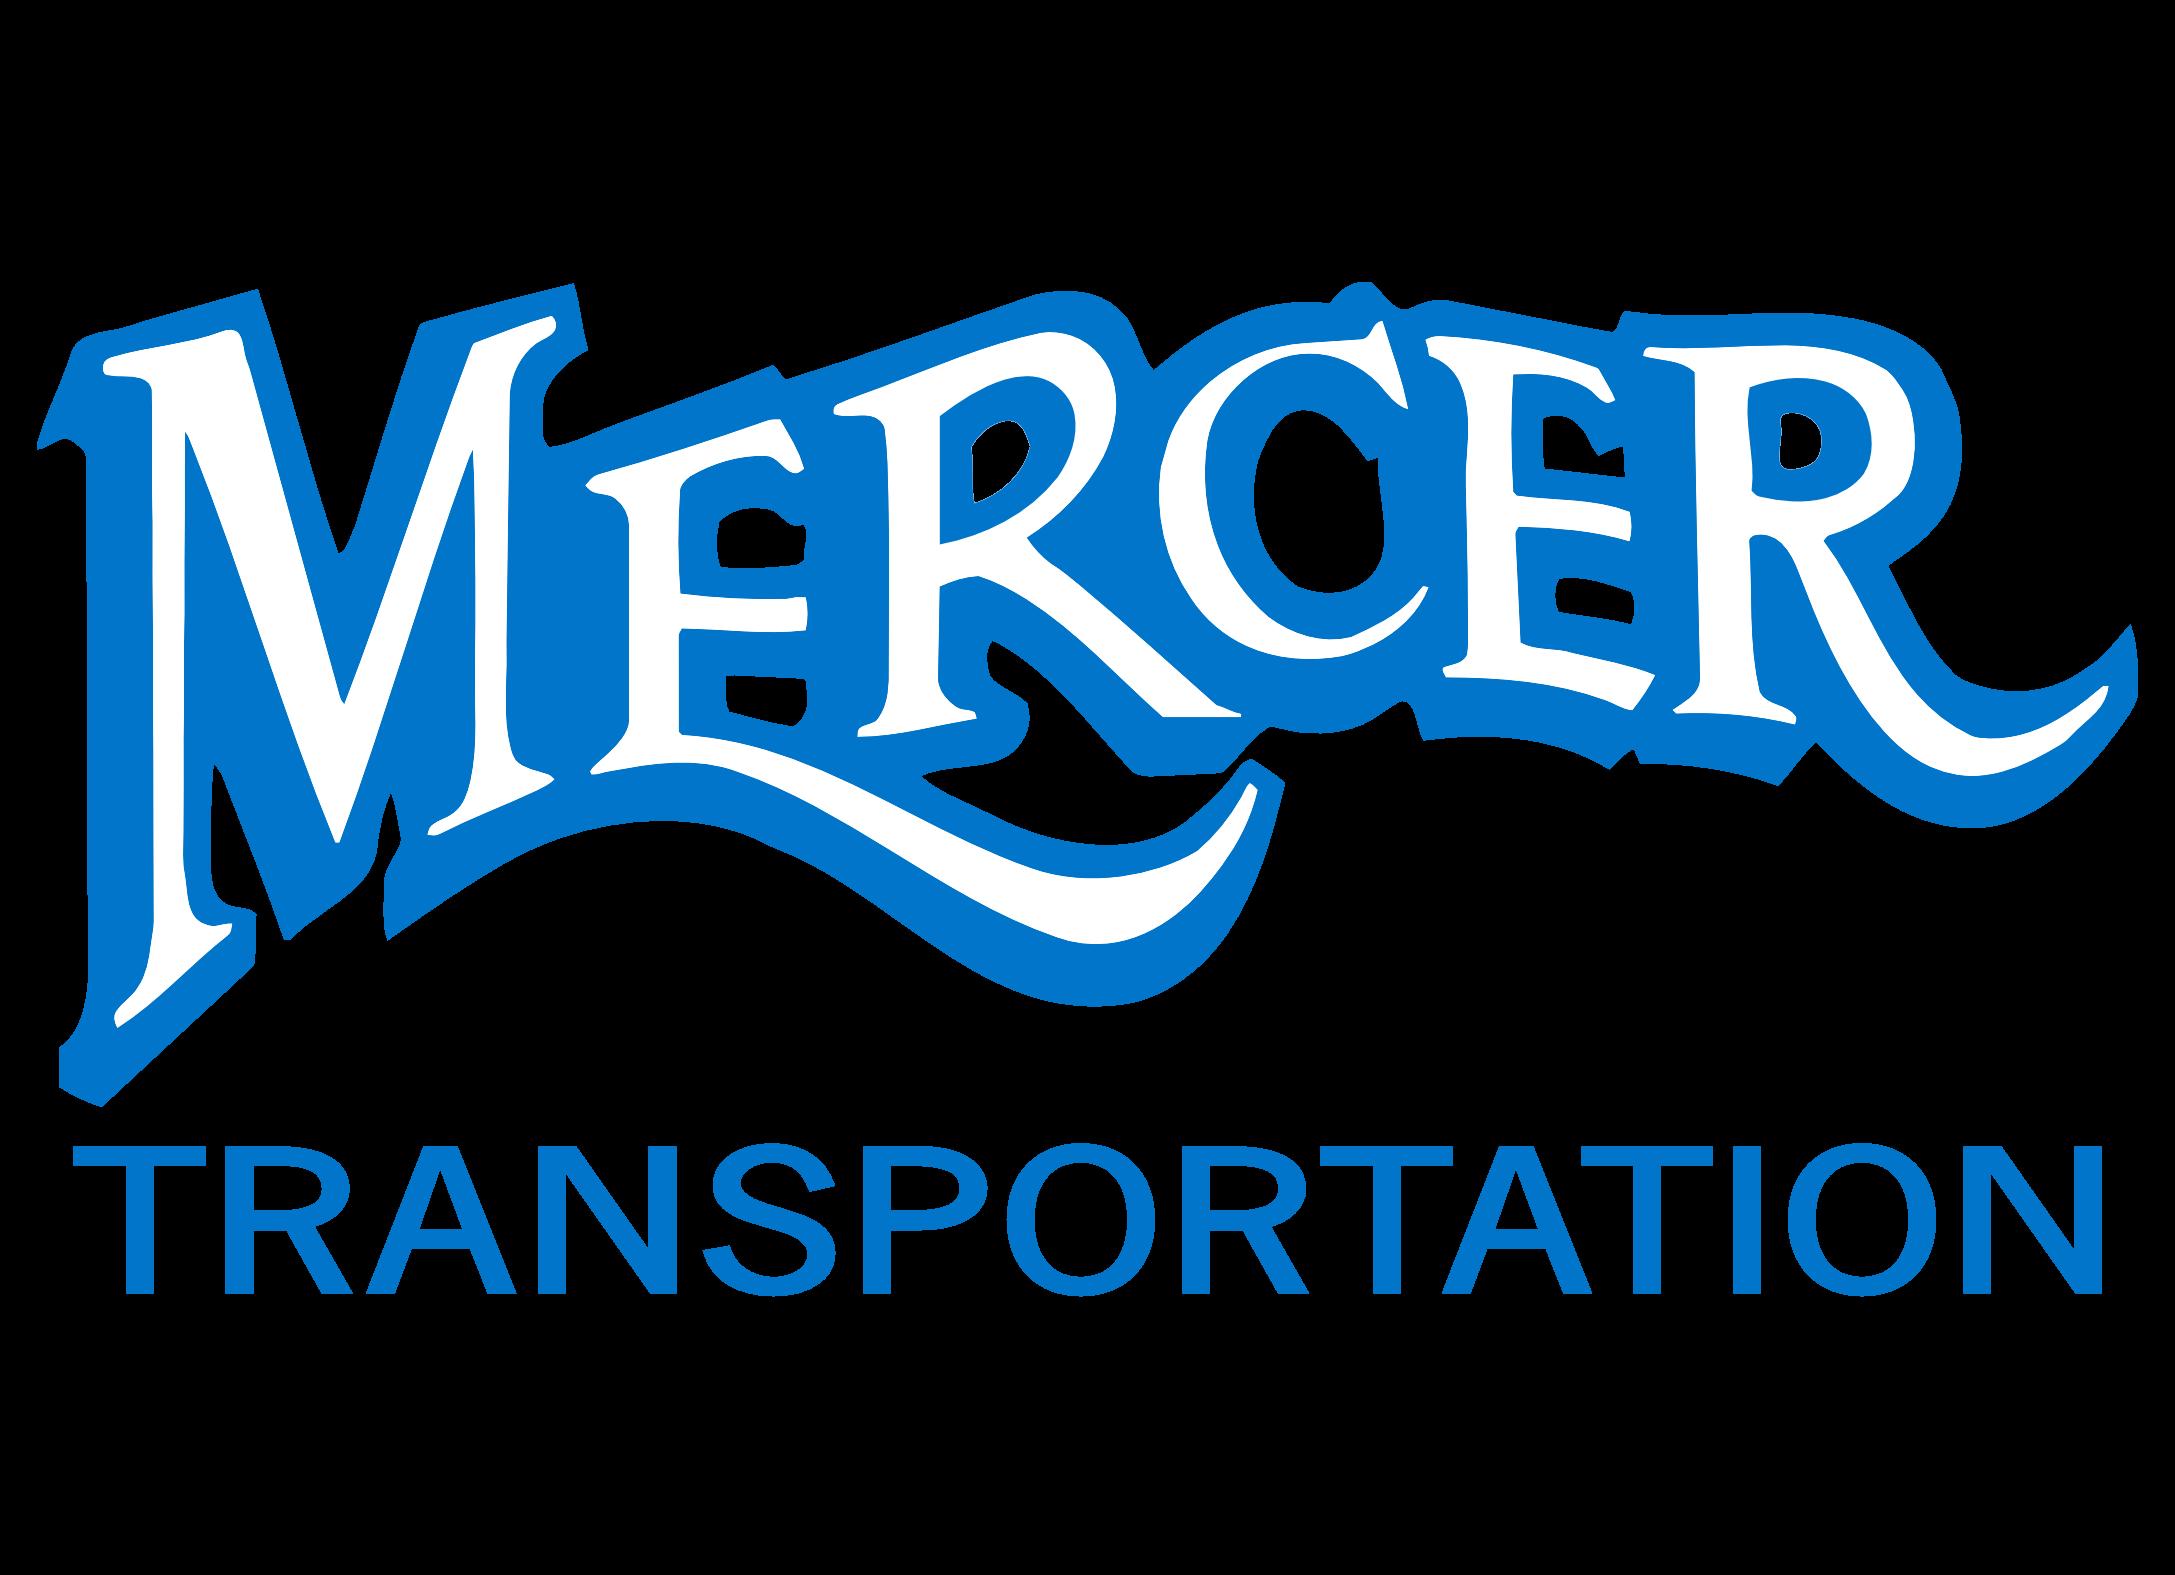 Mercer Transportation - Exceeding Expectations